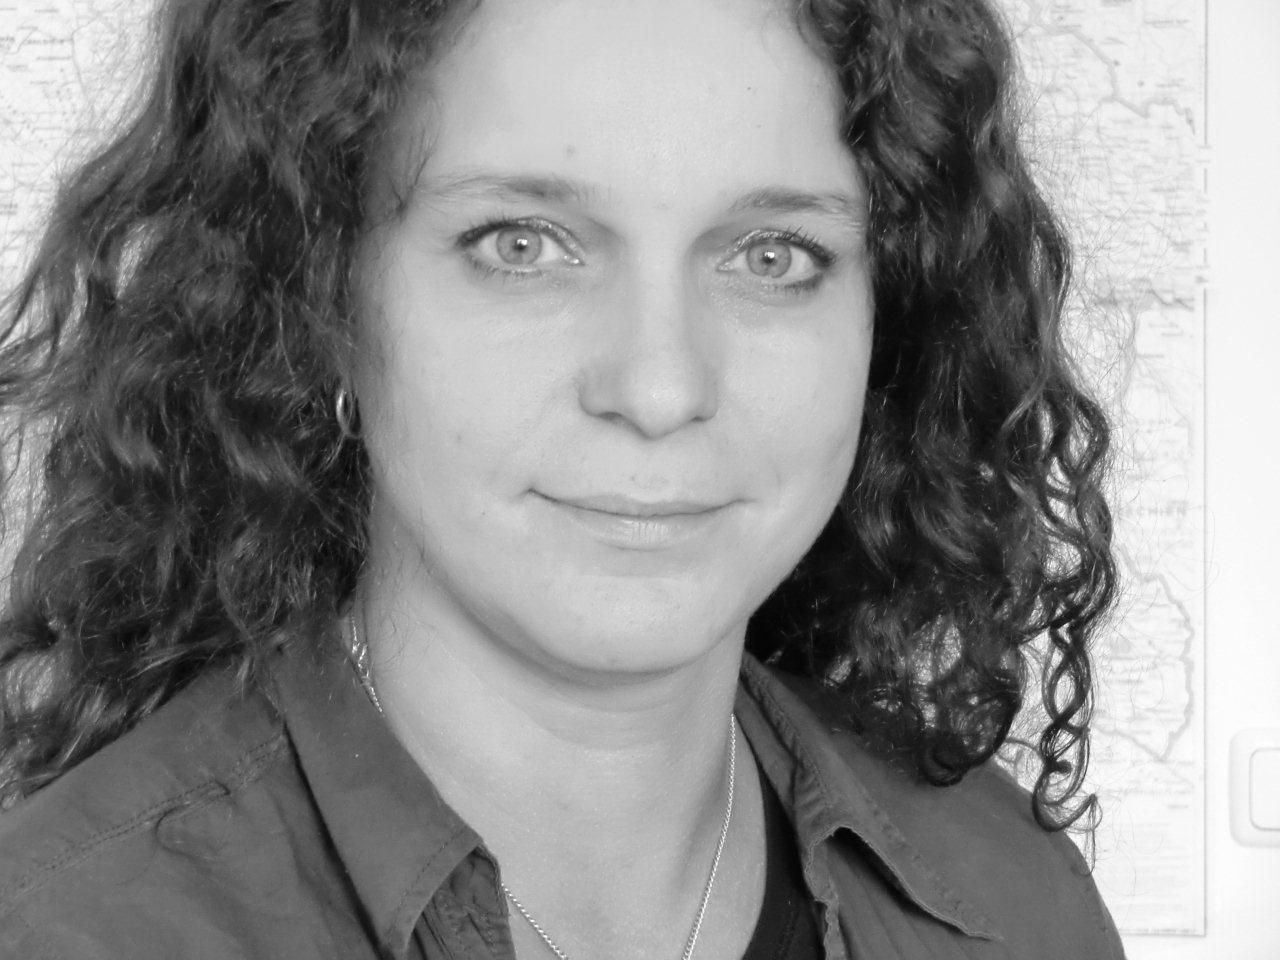 Janina Michaelis